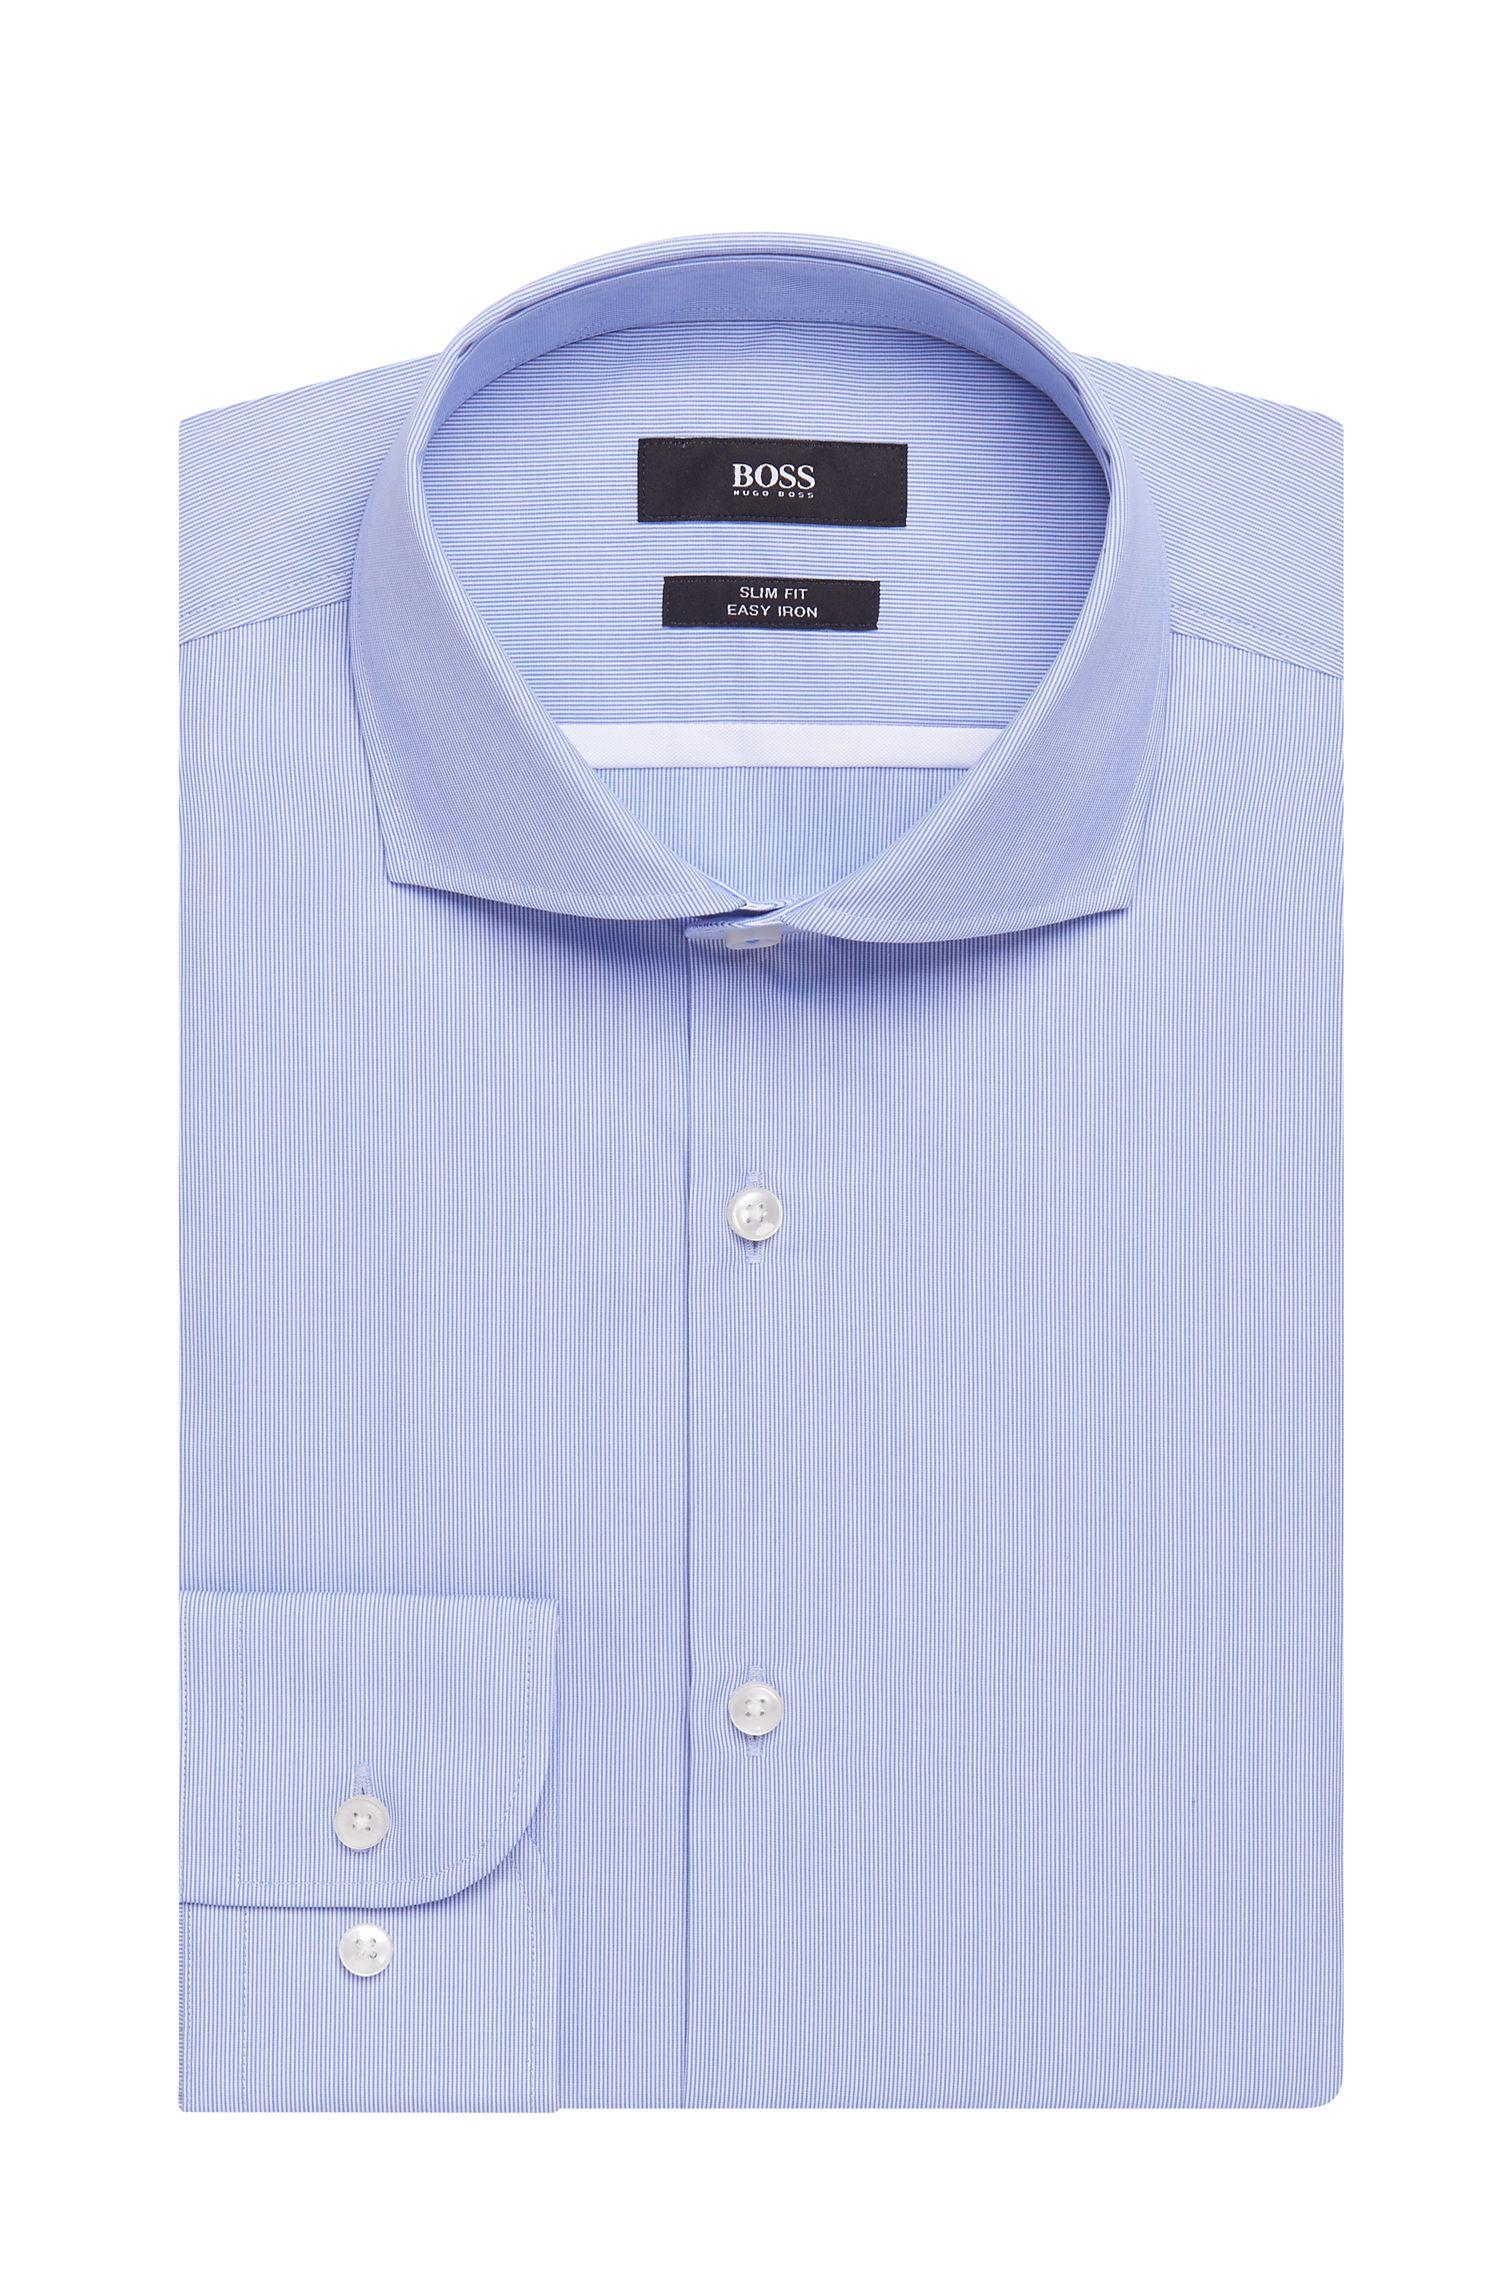 Striped Easy-Iron Italian Cotton Poplin Dress Shirt, Slim Fit | Jerrin